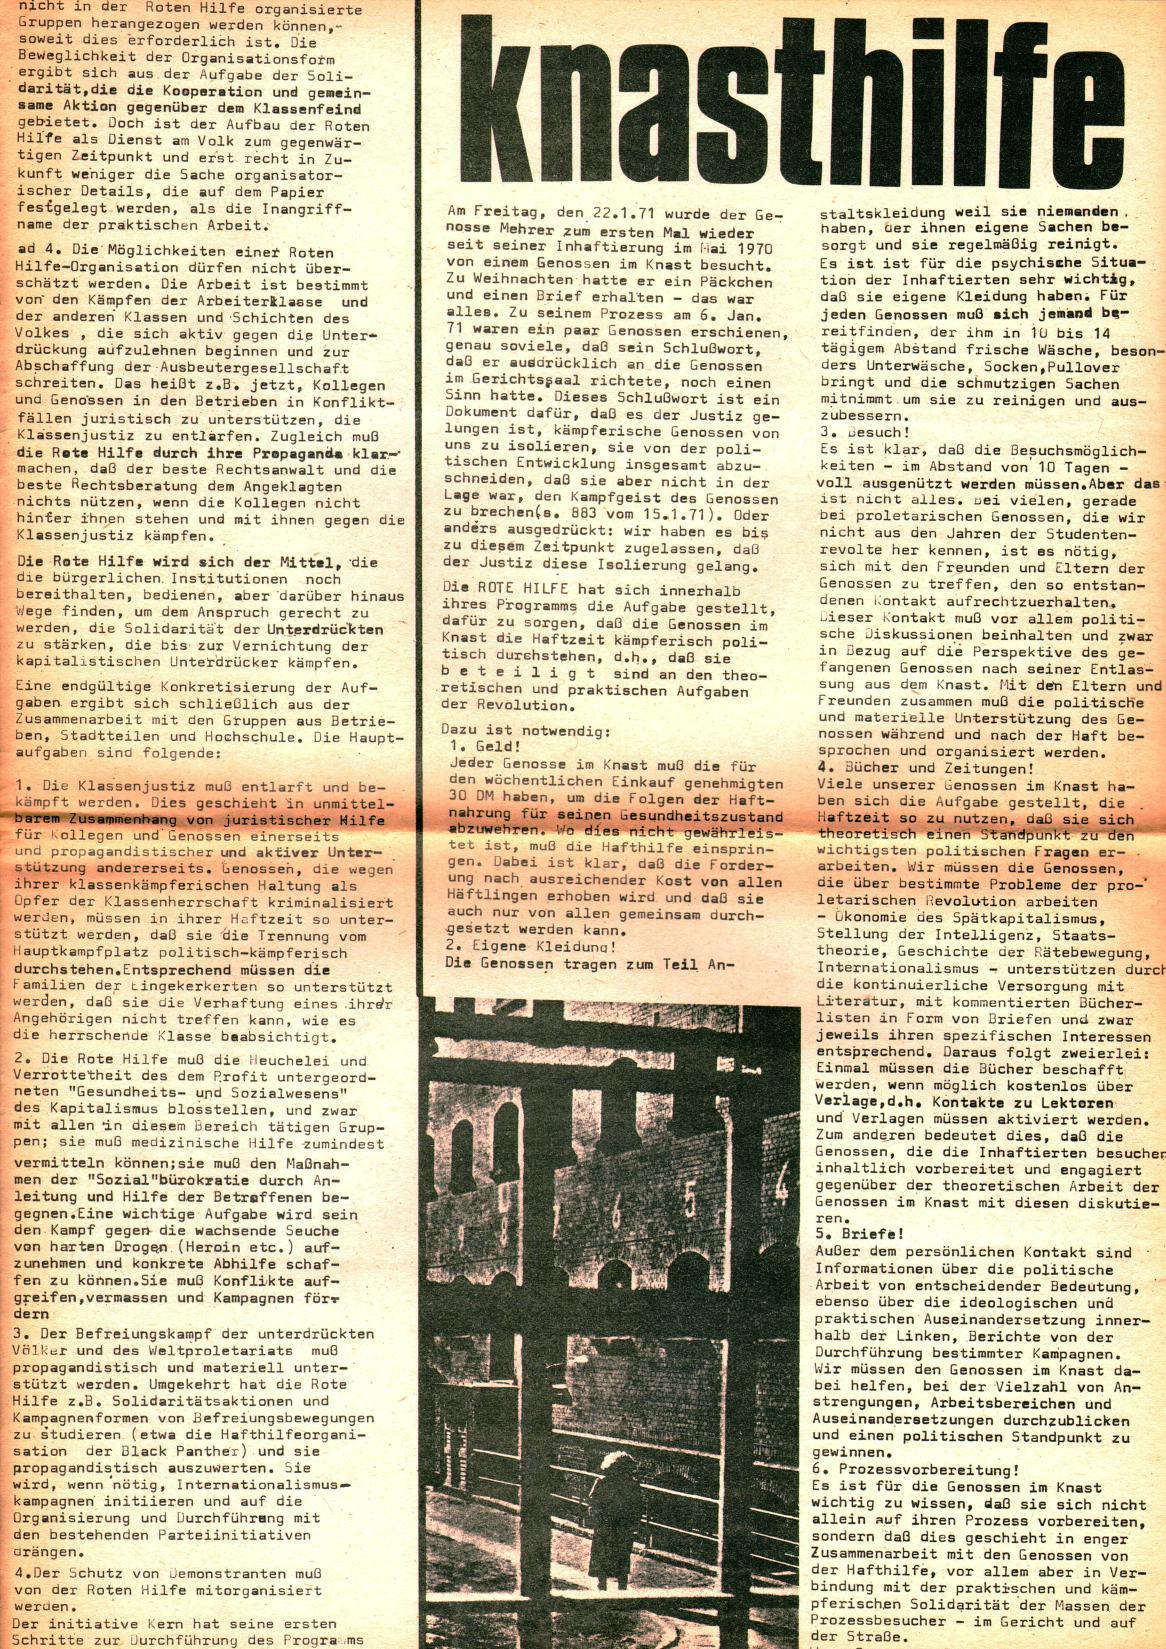 Berlin_Hochschulkampf_1971_01_09